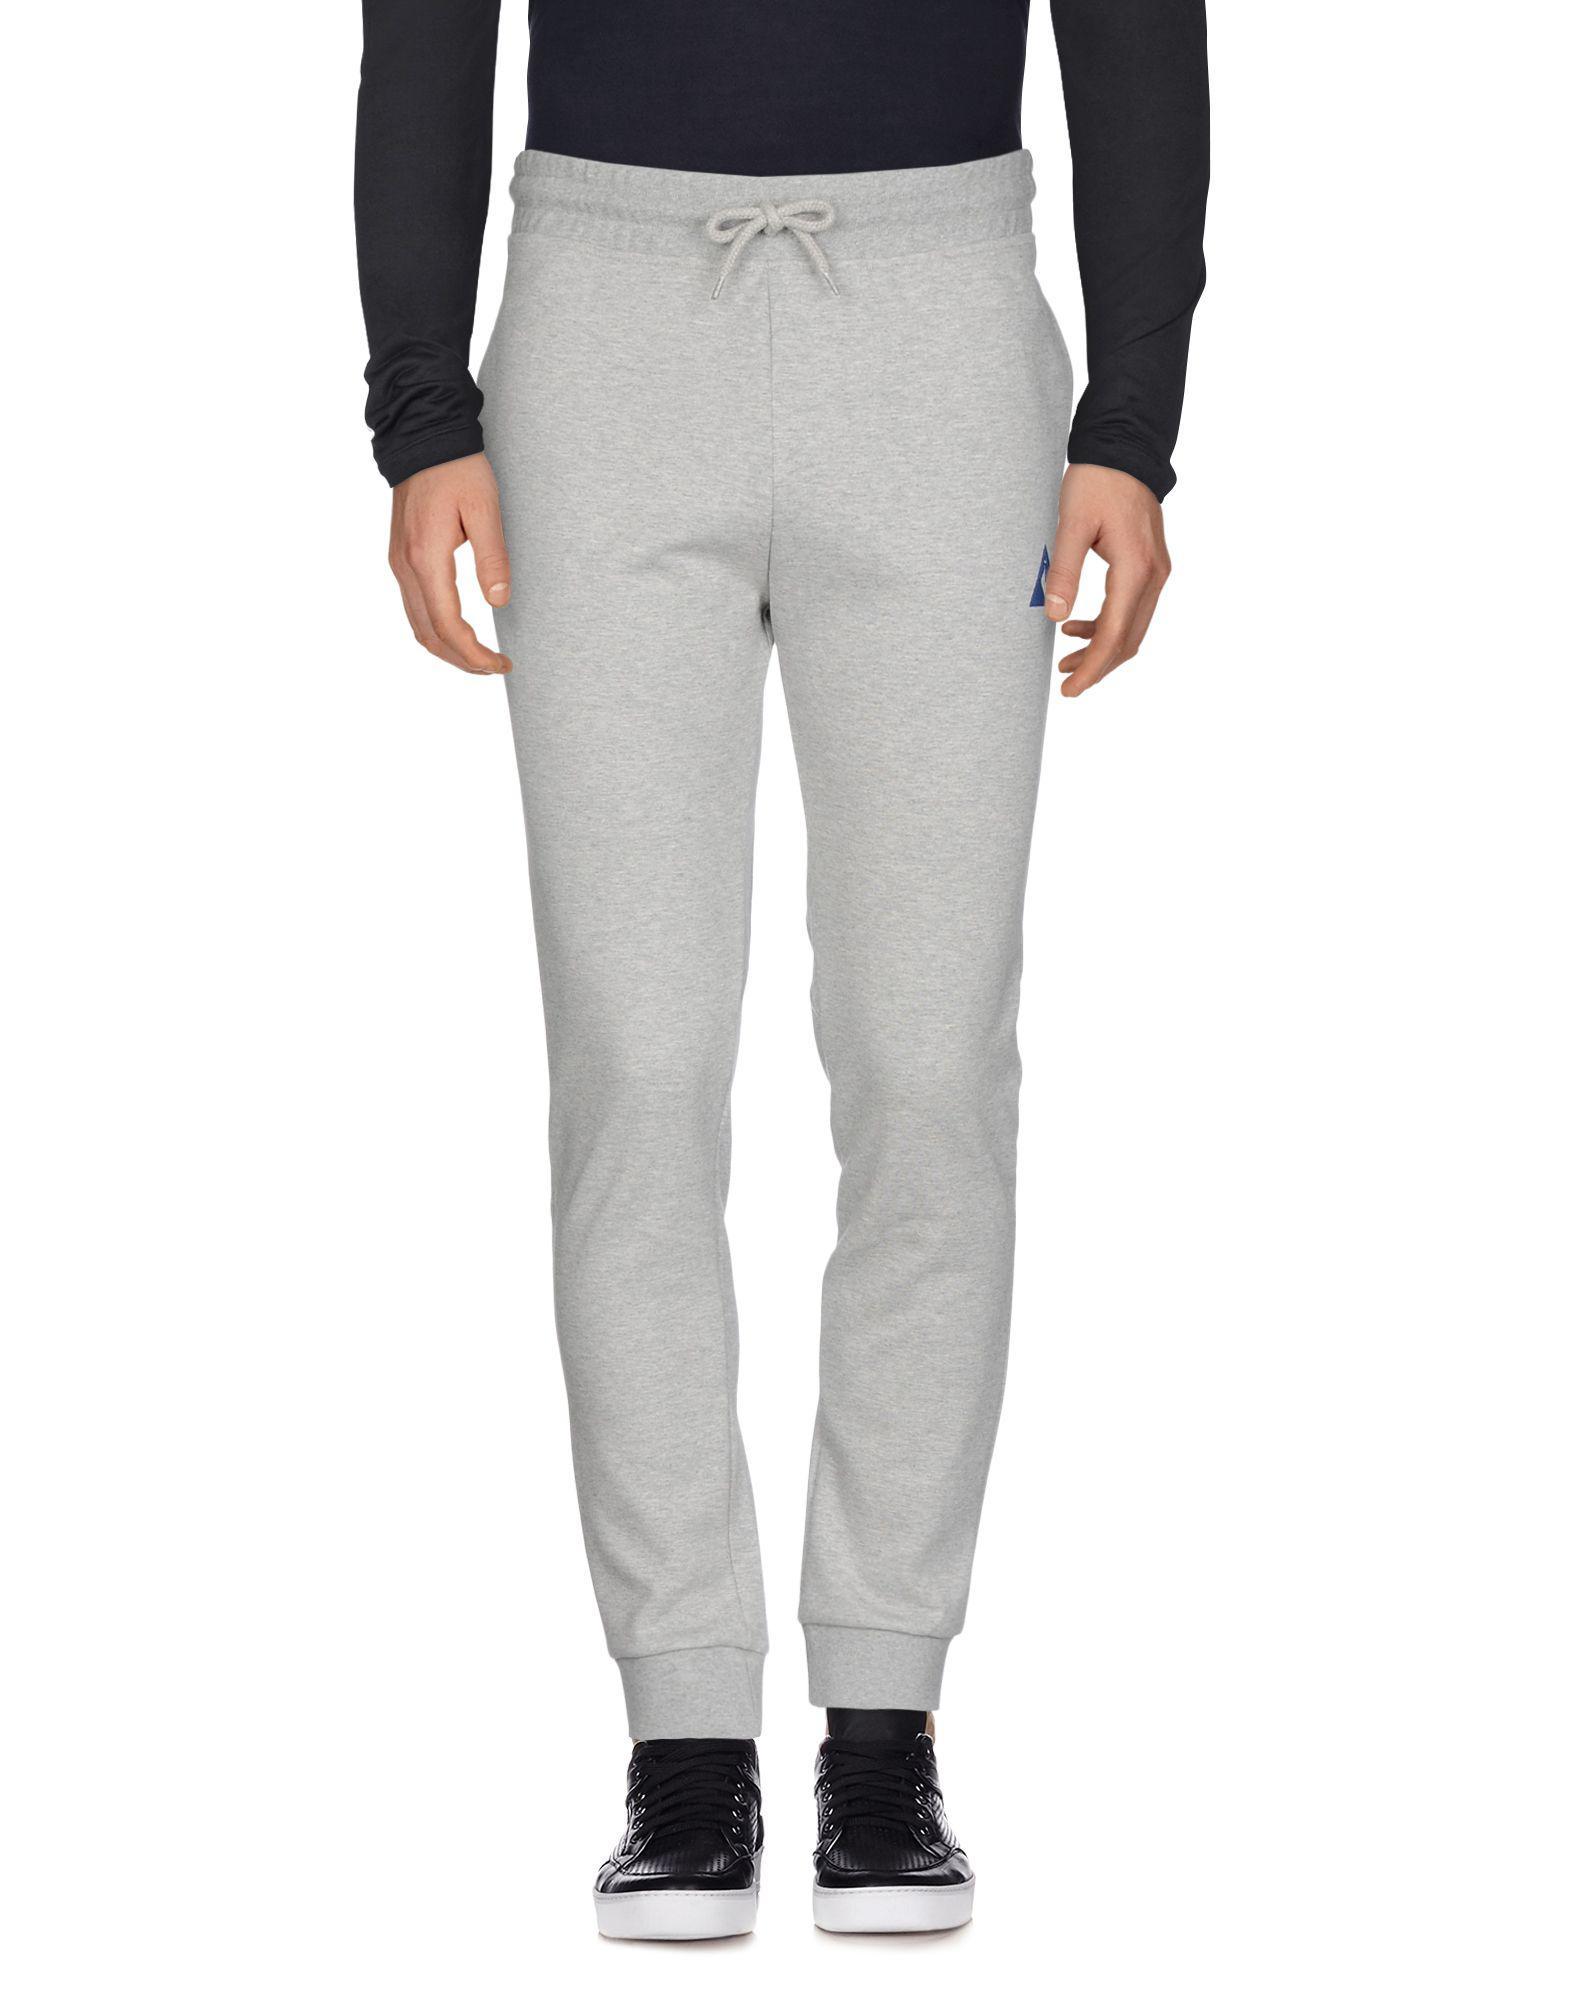 TROUSERS - Casual trousers Le Full FKBK1